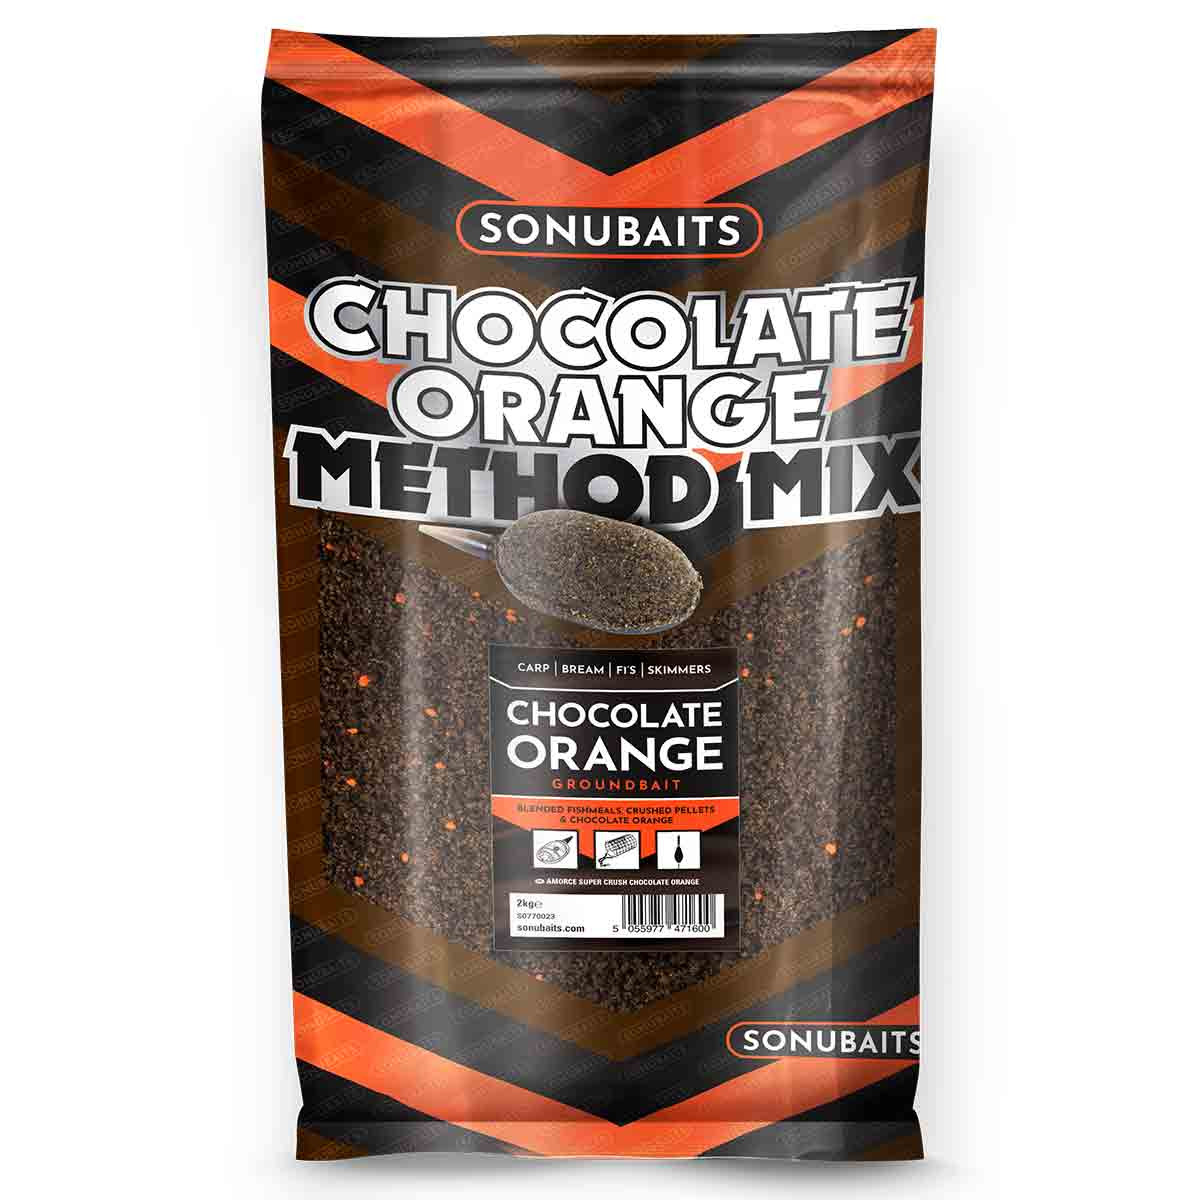 Sonubaits Chocolate Orange Method Mix 2kg